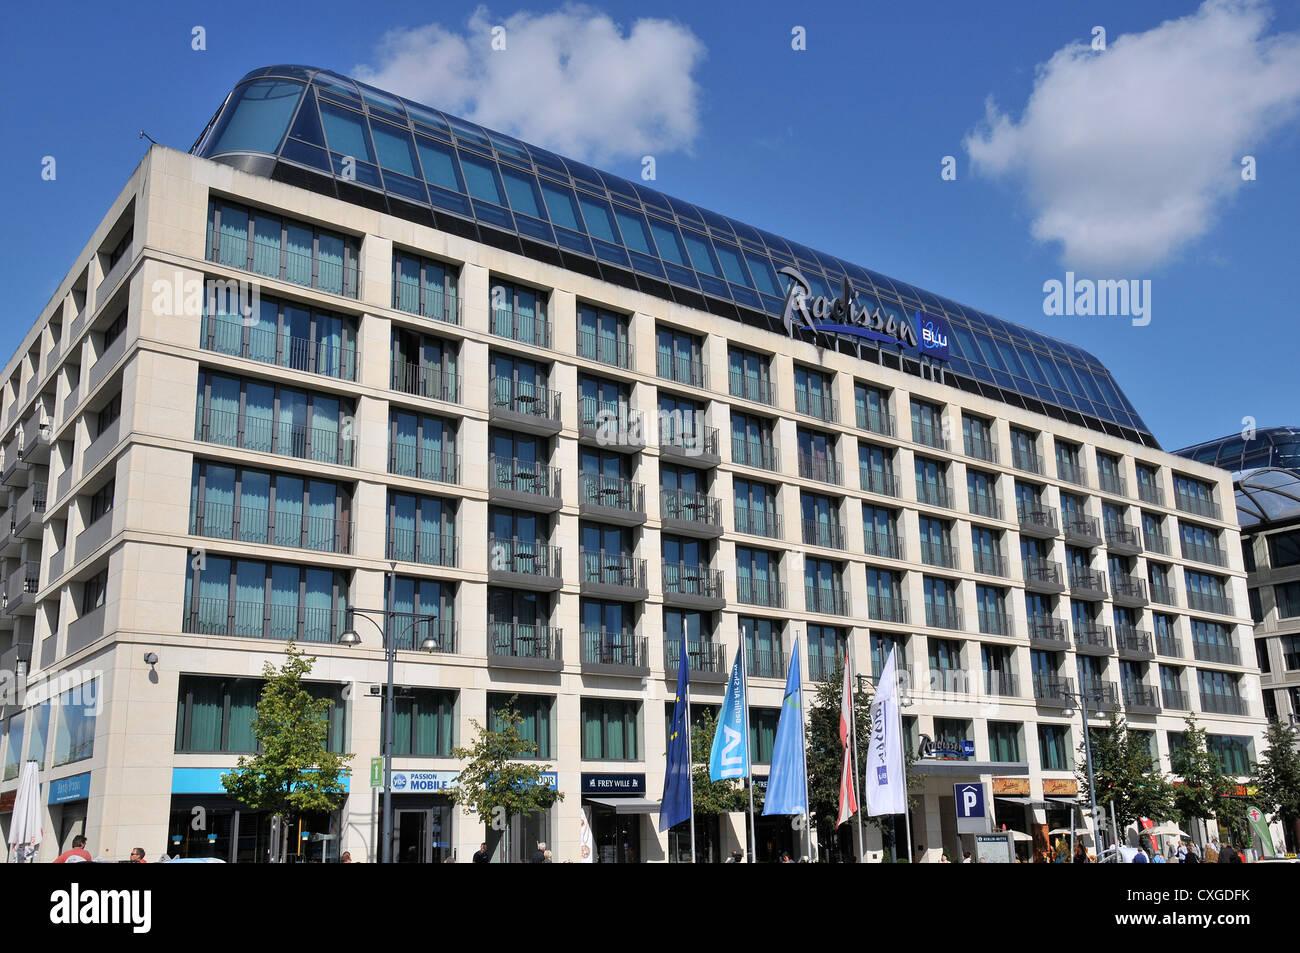 Radisson Blu hotel Berlin Germany - Stock Image